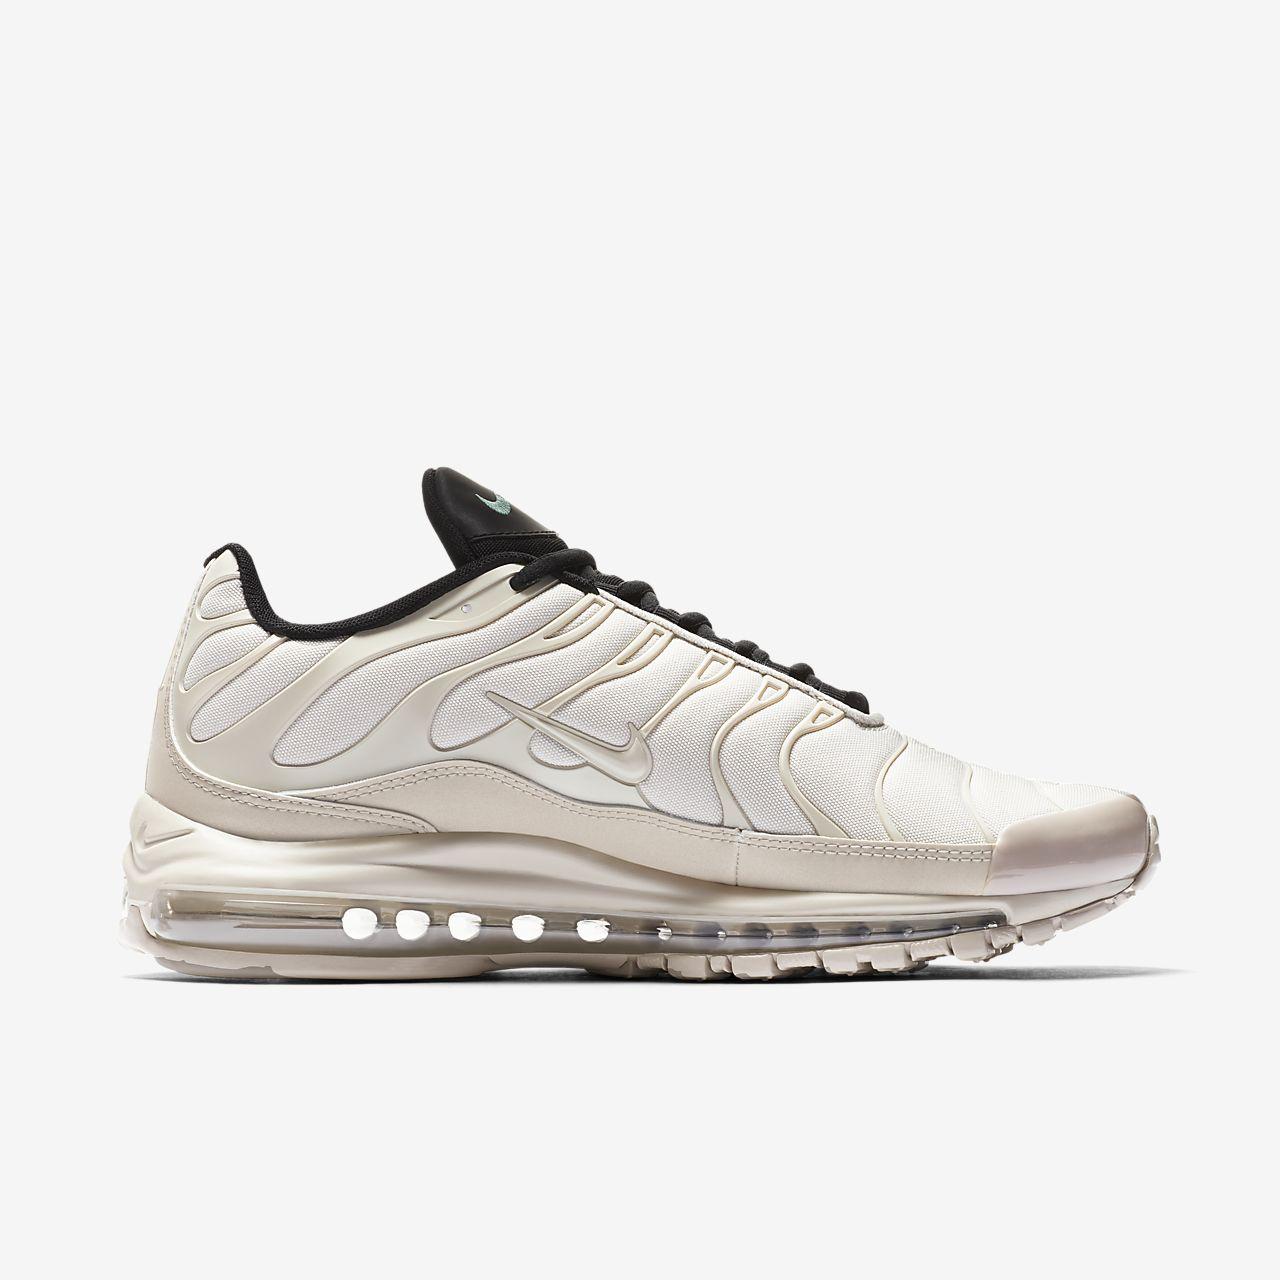 outlet store sale 5f272 f3eb7 Sko för män. Nike Air Max 97 Plus